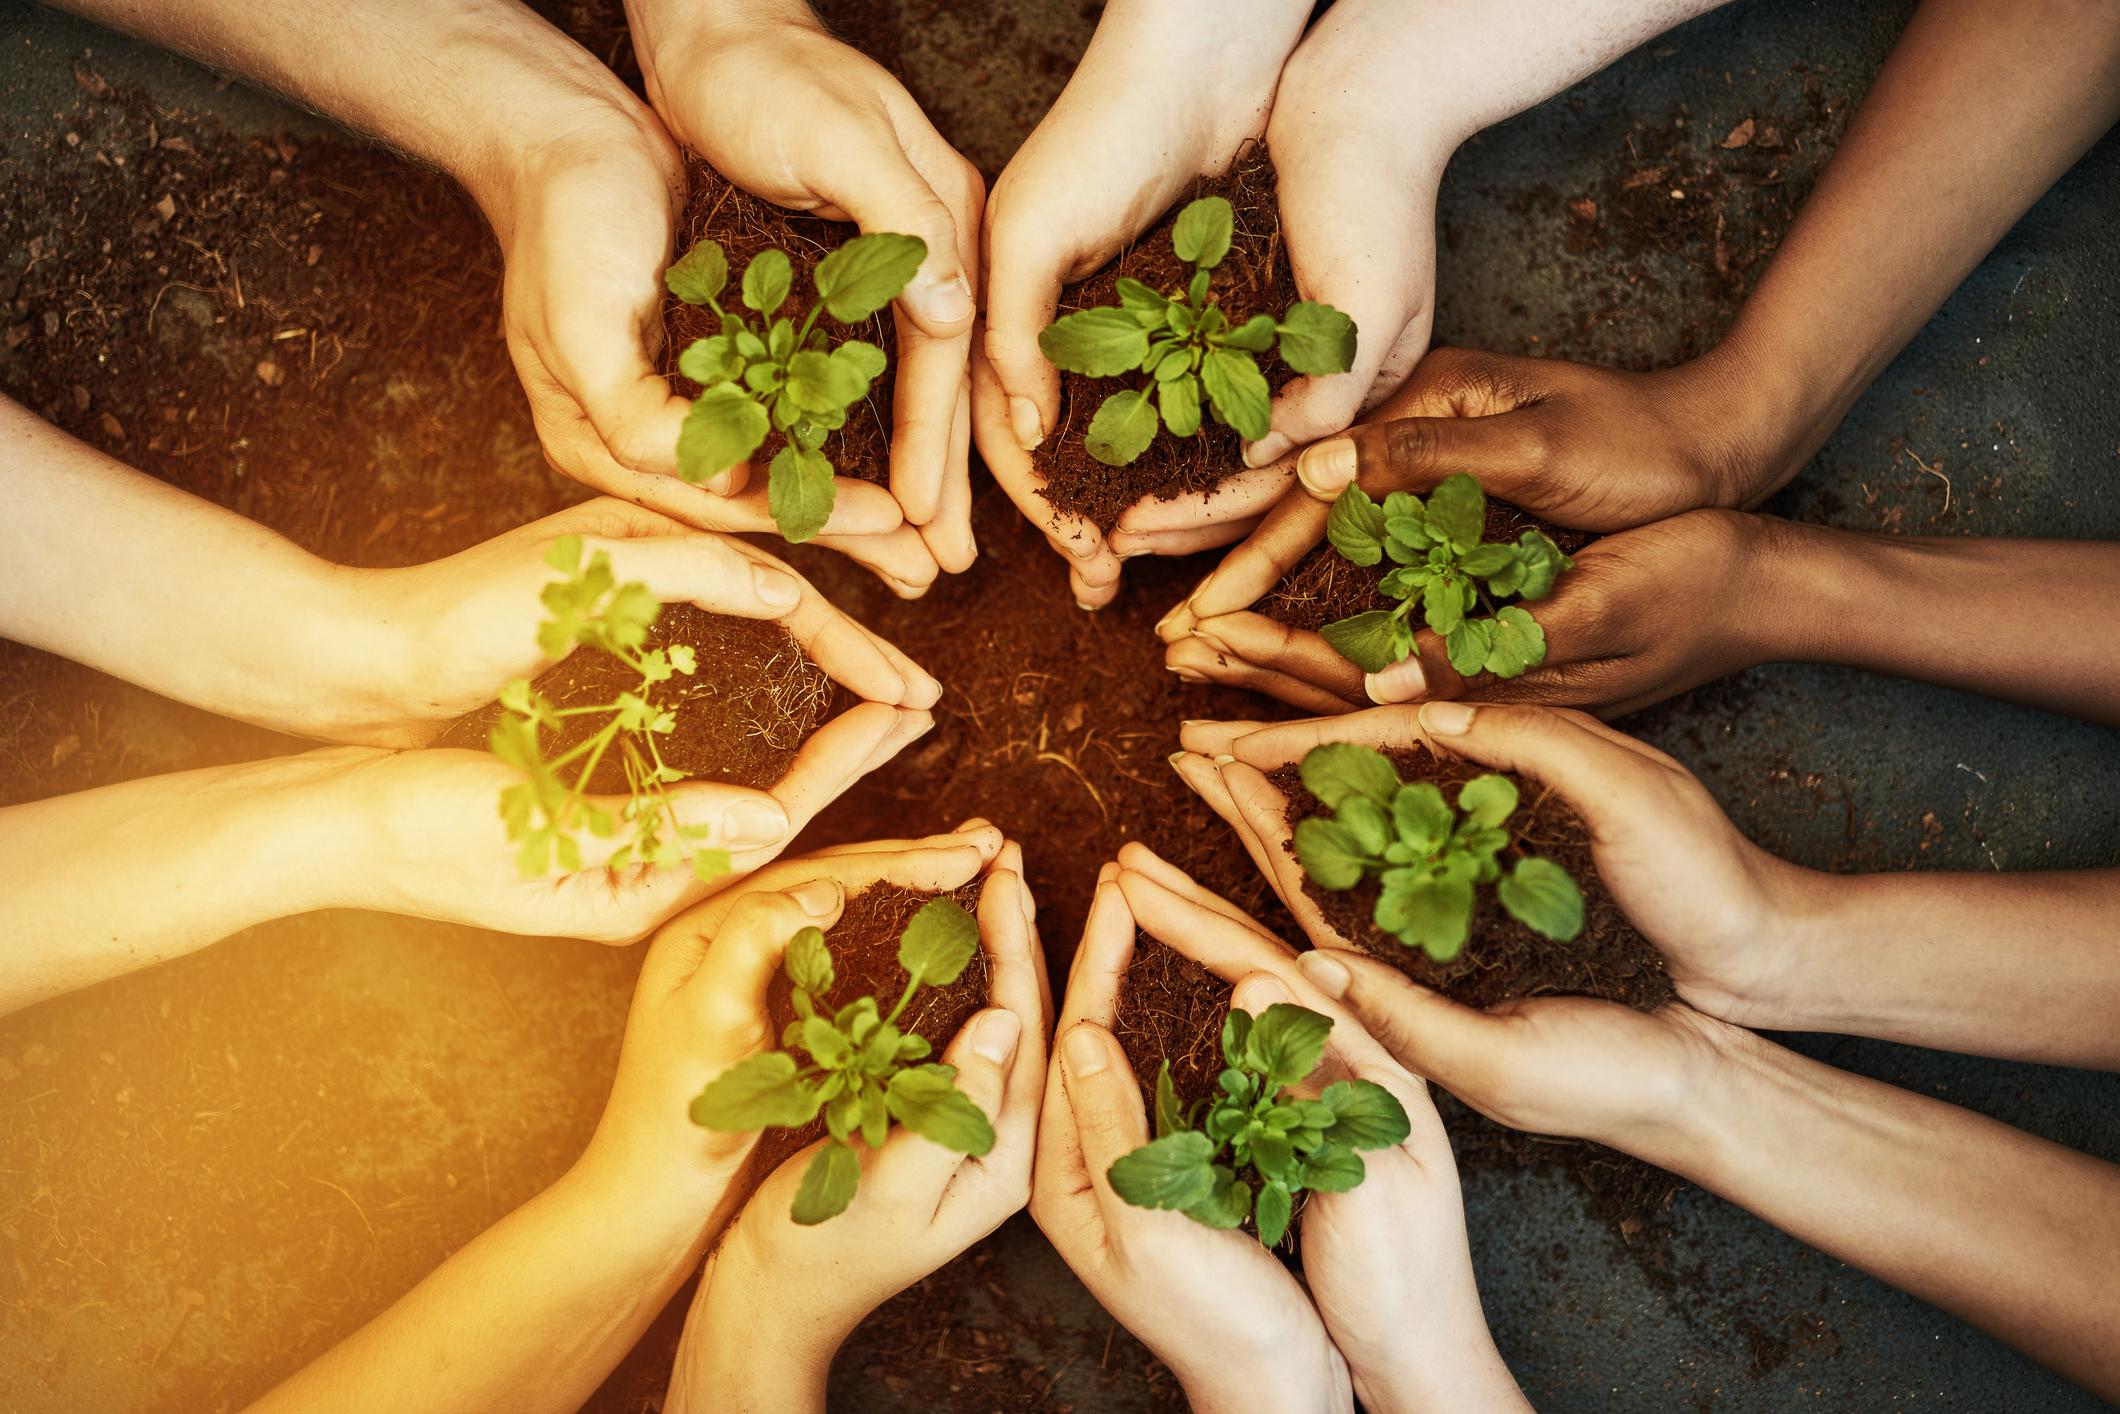 community Grants Writing Funding